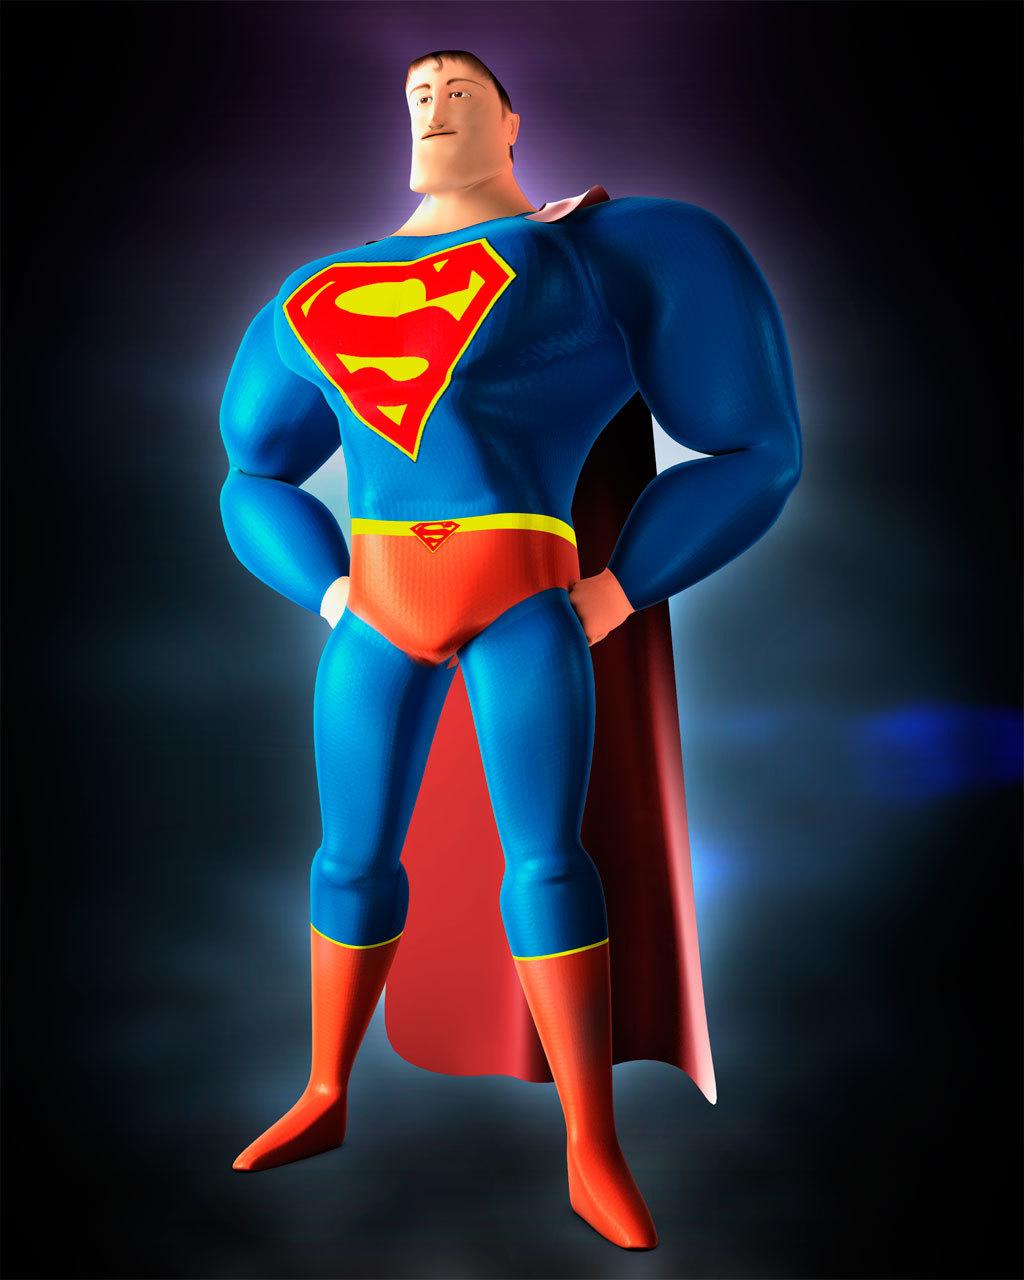 Pcanime super superman 1 5bec3492 pwz1